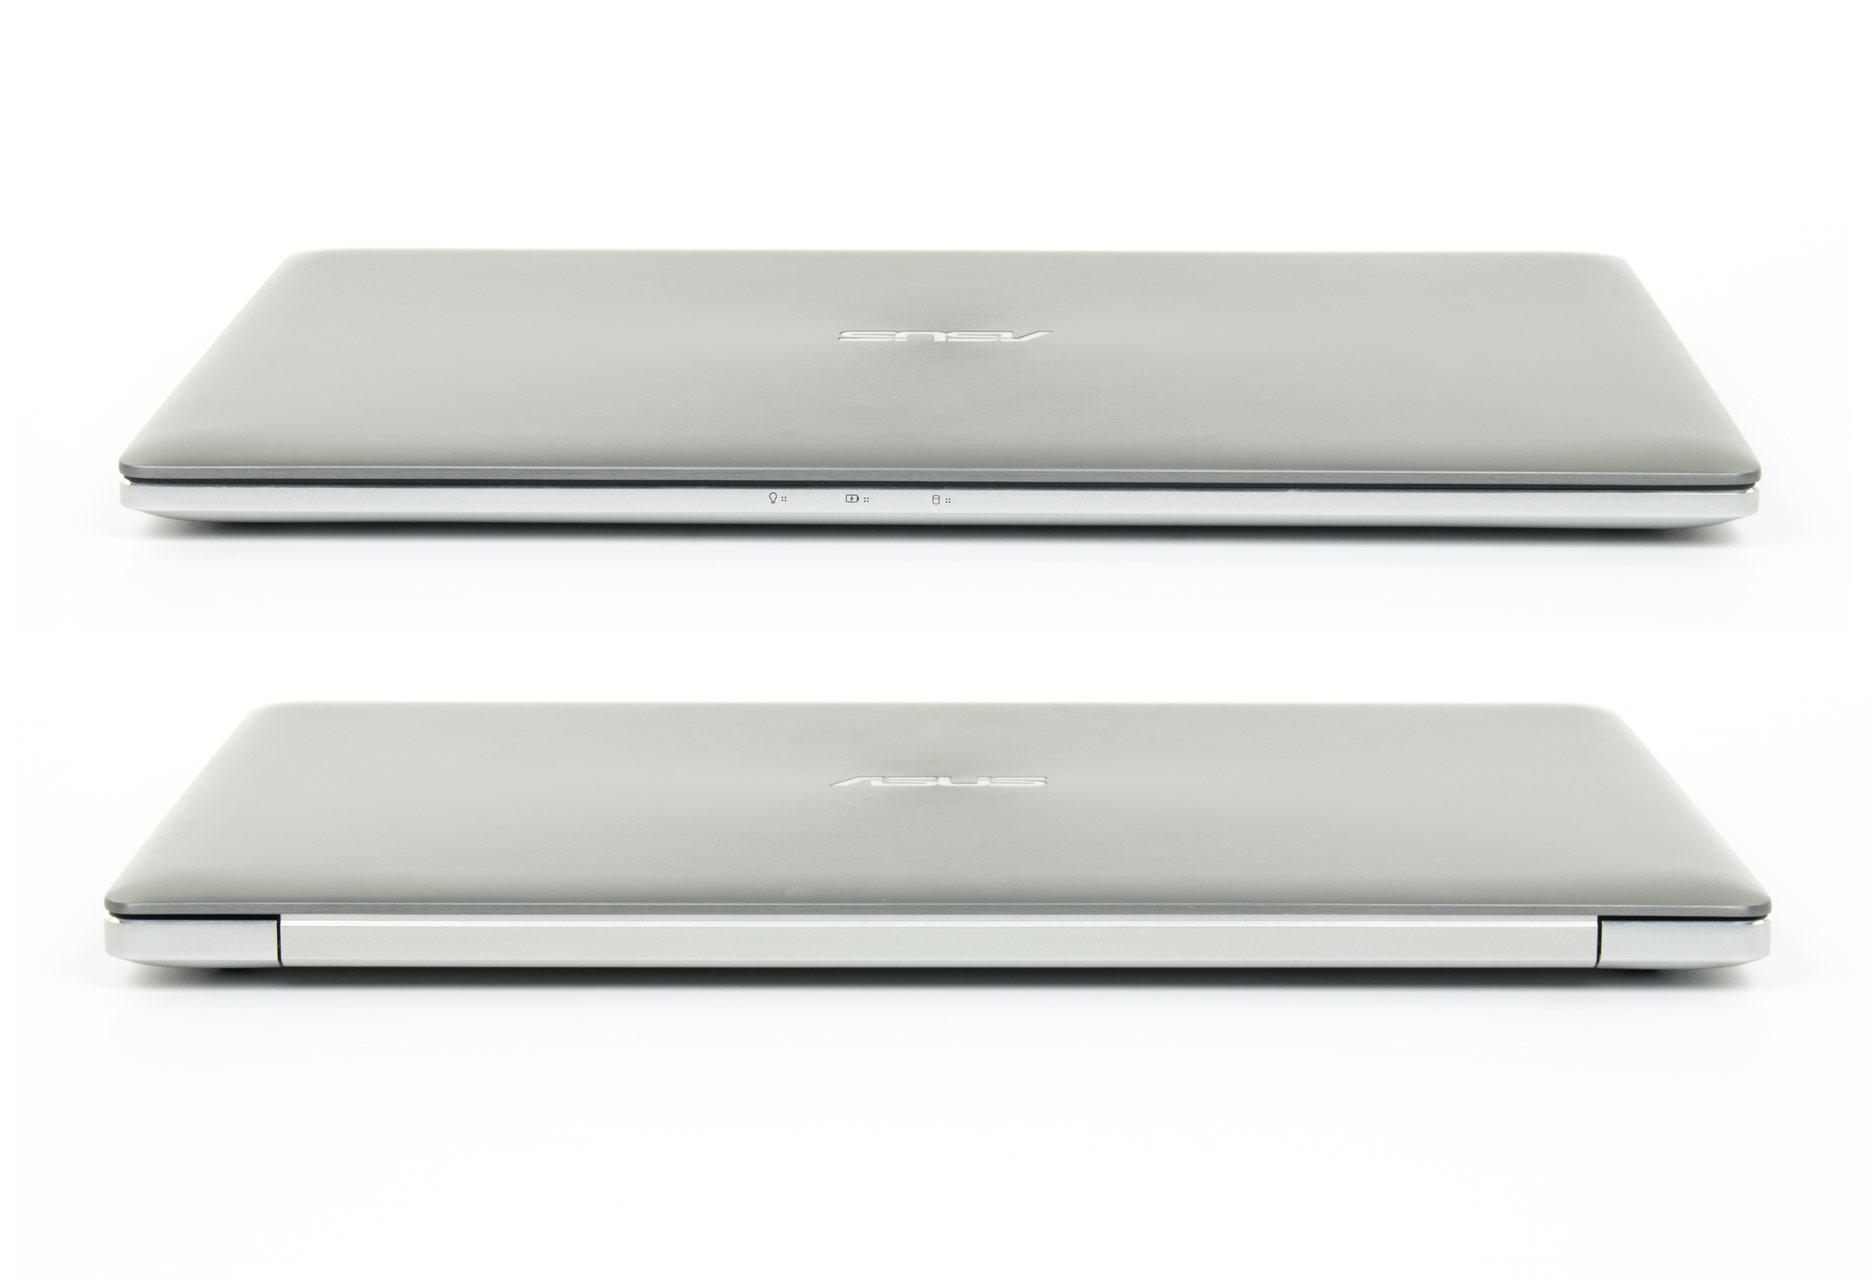 Asus Zenbook Pro UX501 przód i tył